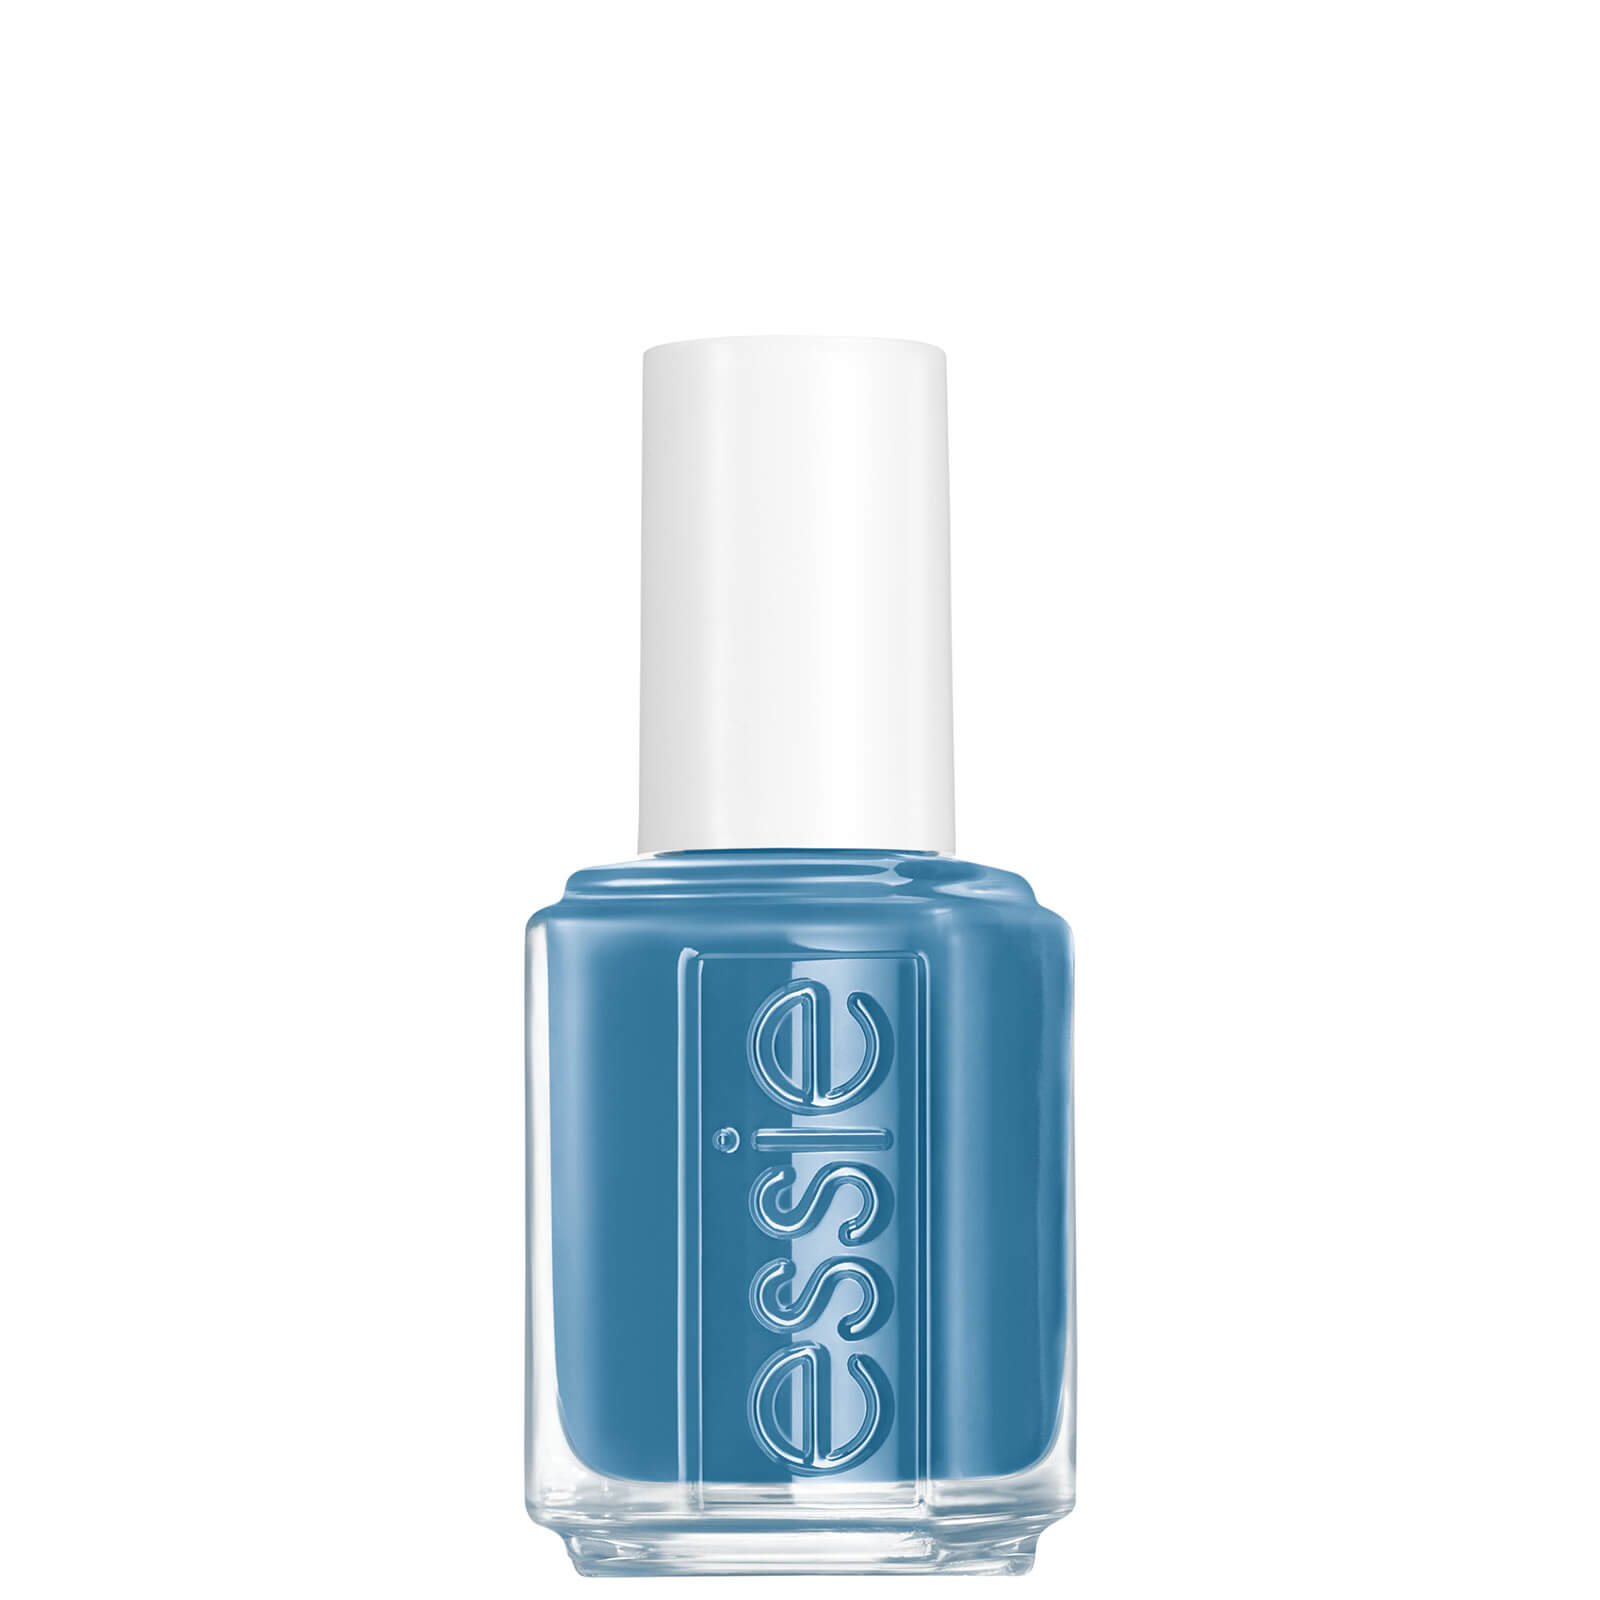 Купить Essie Core Nail Polish 13.5ml (Various Shades) - 787 Amuse Me